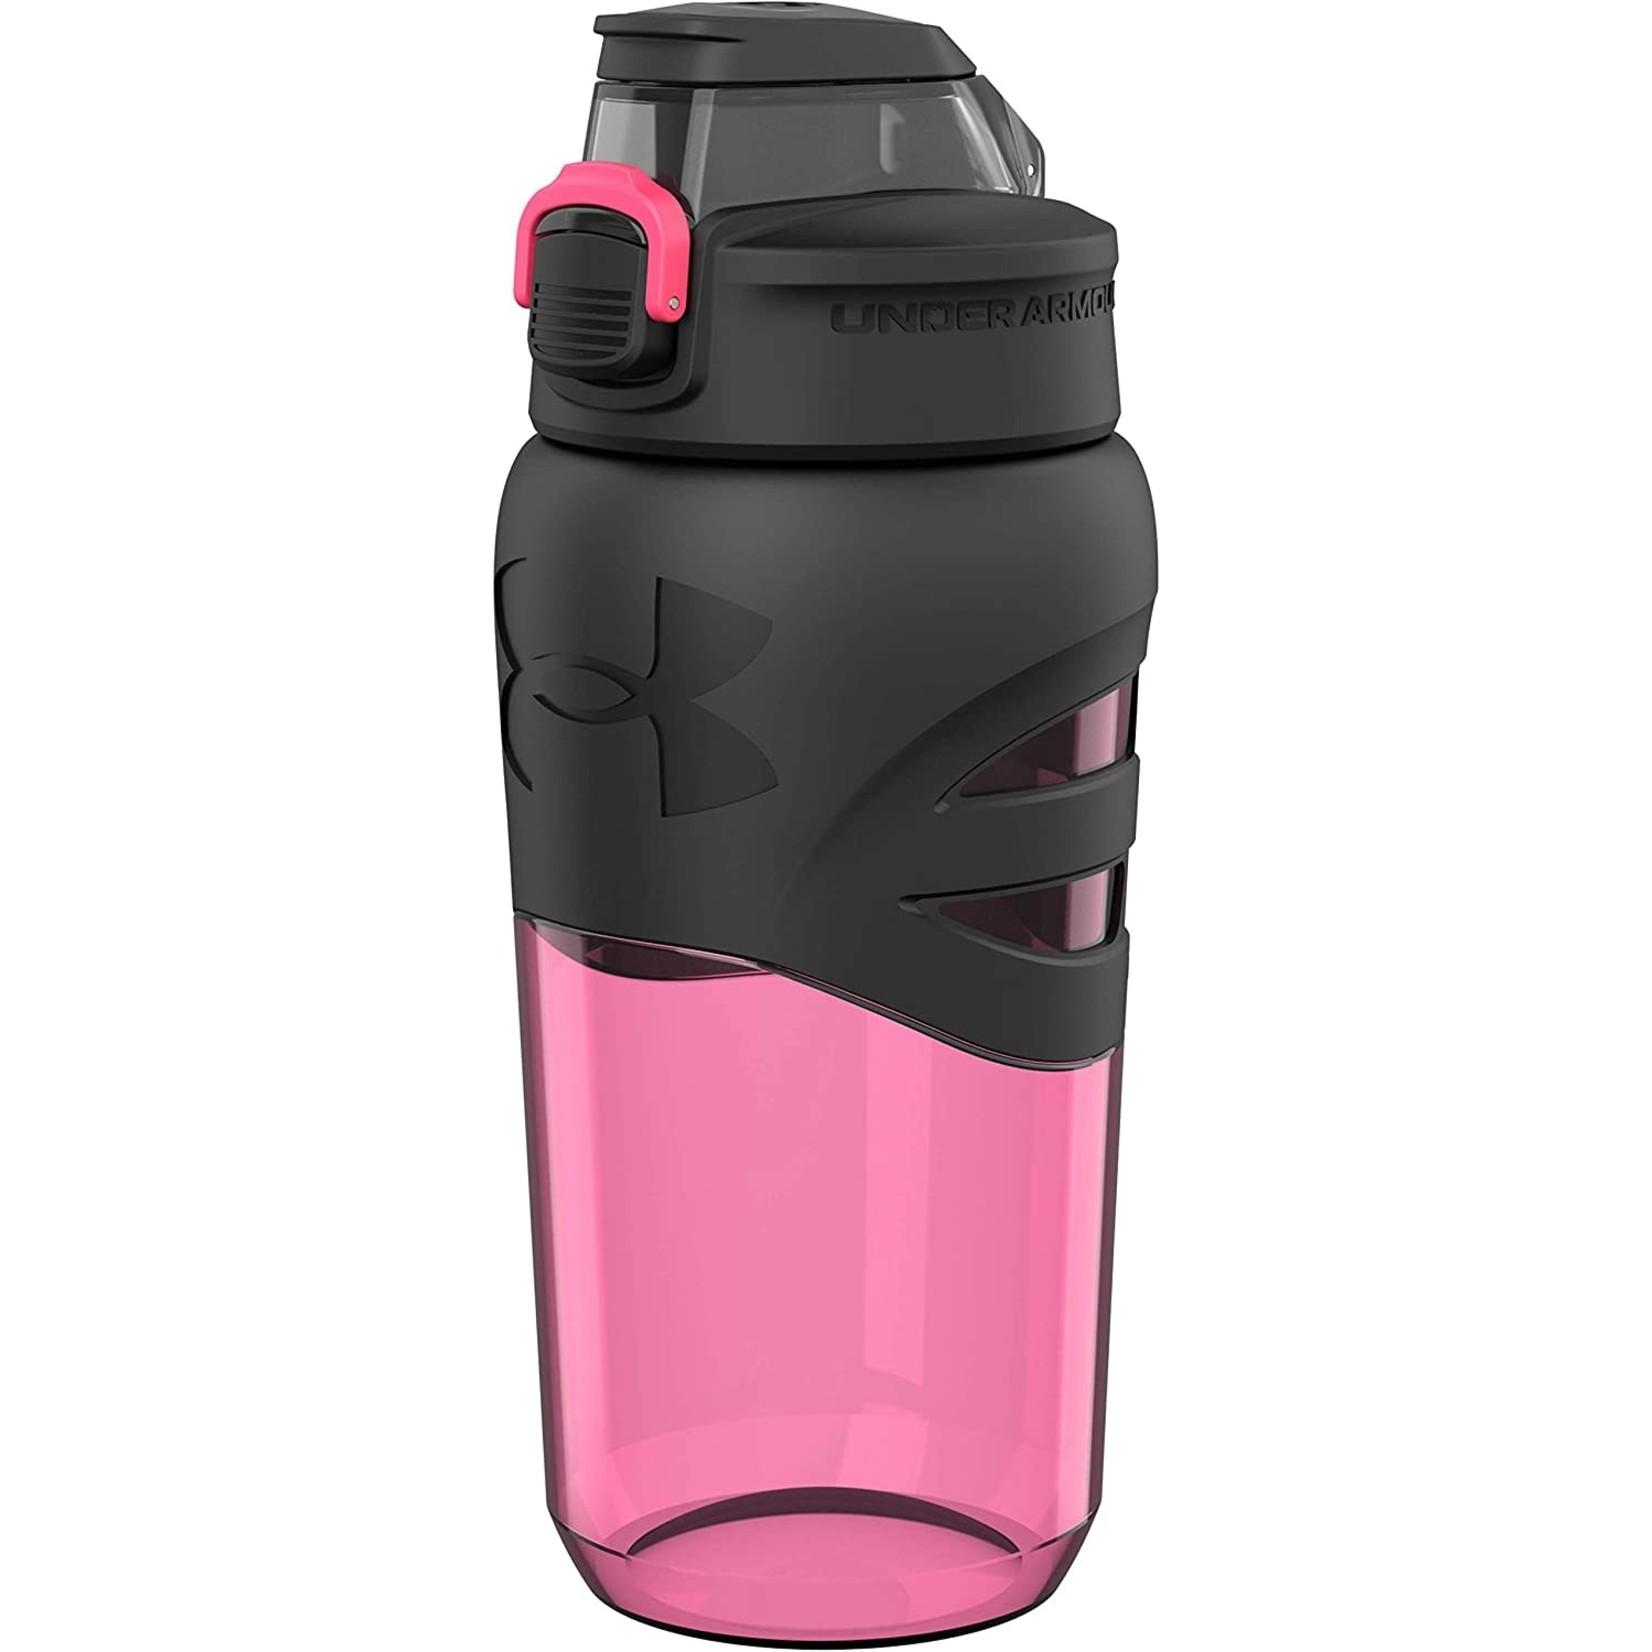 Under Armour Under Armour Water Bottle, 18oz Draft